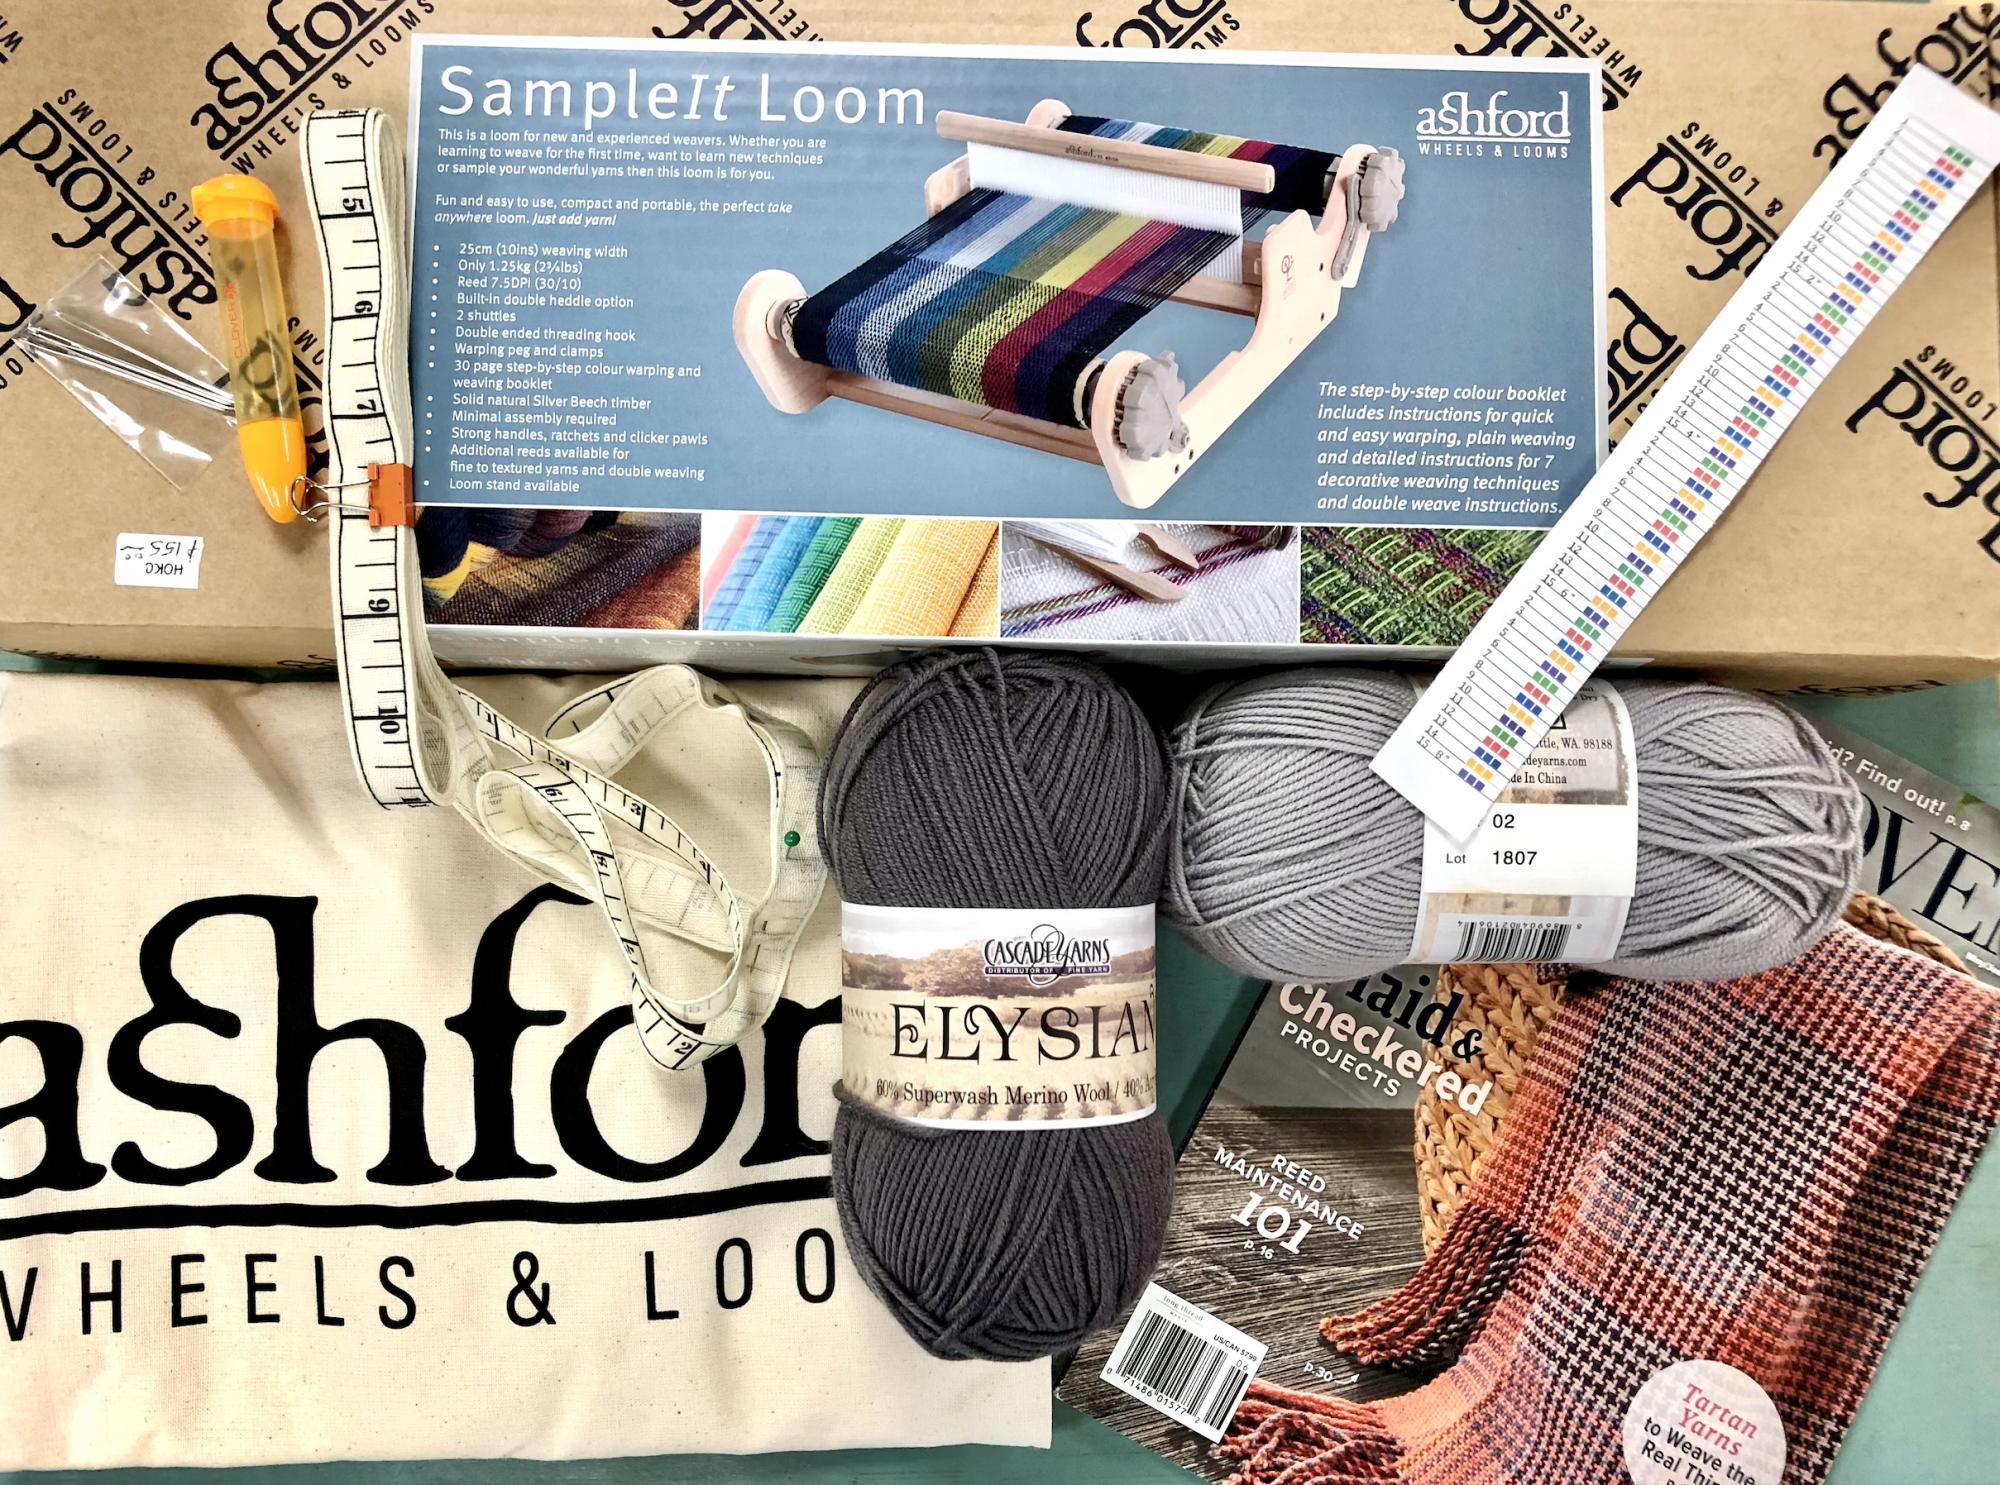 Ashford All in the Box 10 Inch Sample It Loom Kit